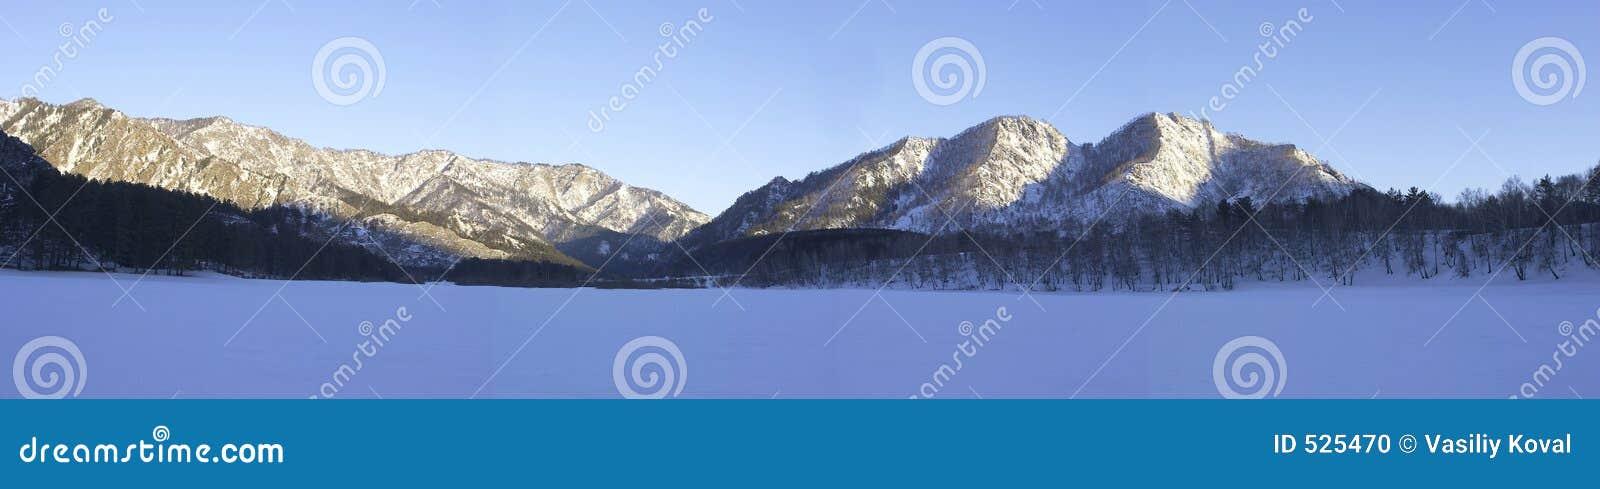 Download 全景冬天 库存照片. 图片 包括有 全景, 晒裂, 冬天, 天空, 森林, 杉木, 横向, 俄国, 结构树, 西伯利亚 - 525470